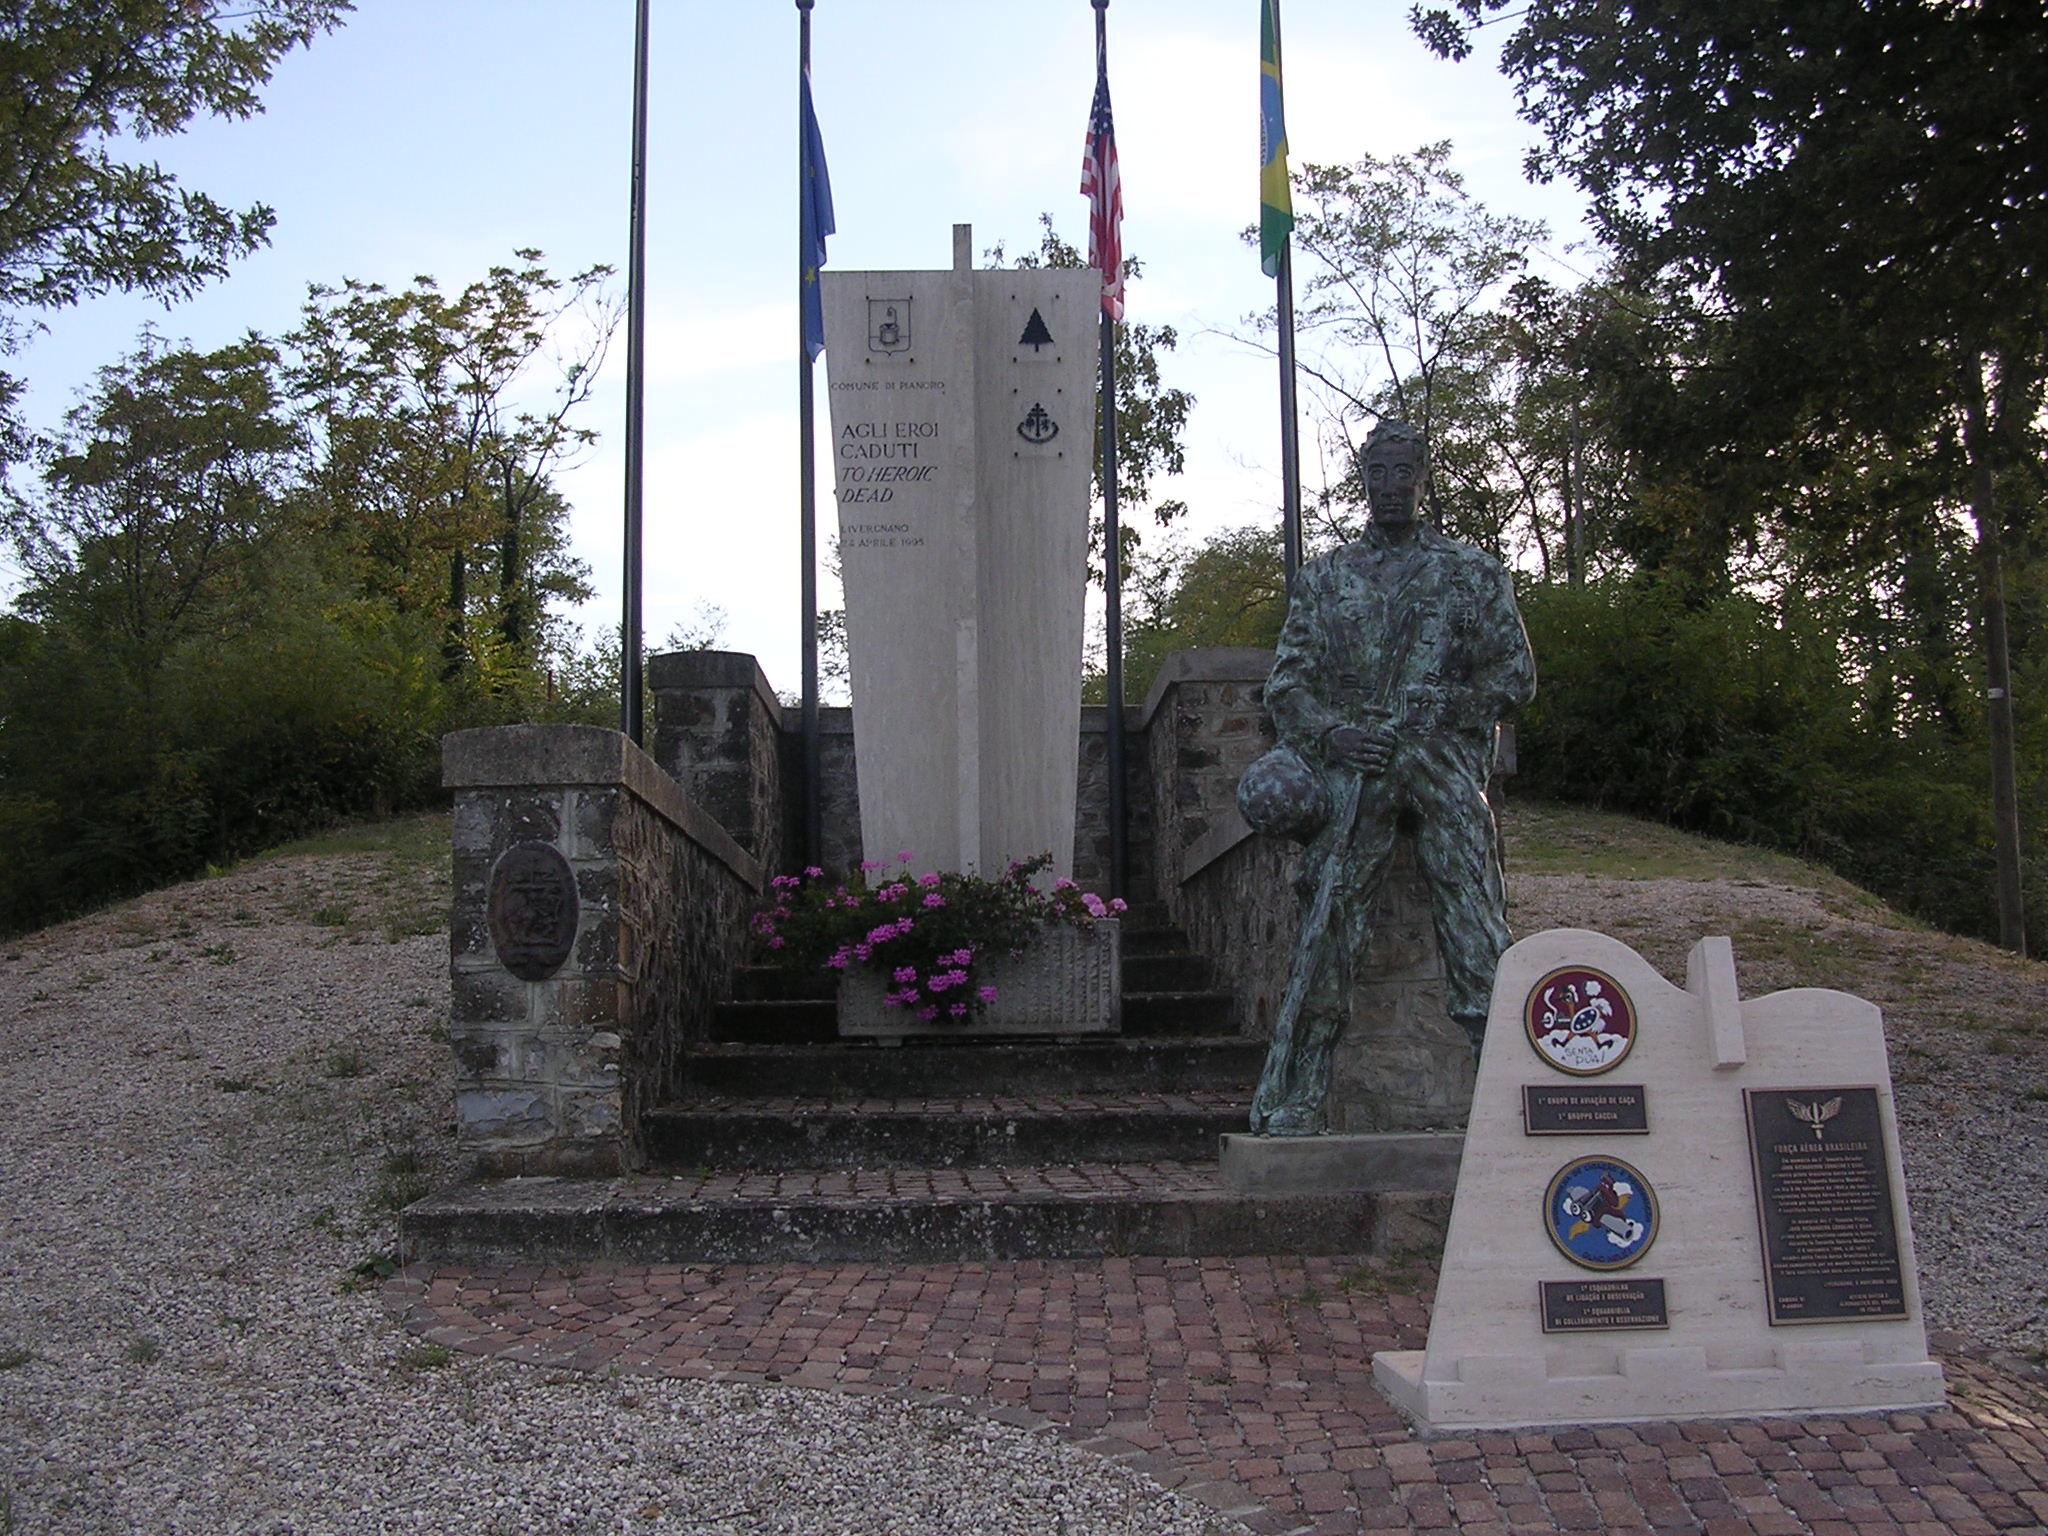 Livergnano-monumento.jpg